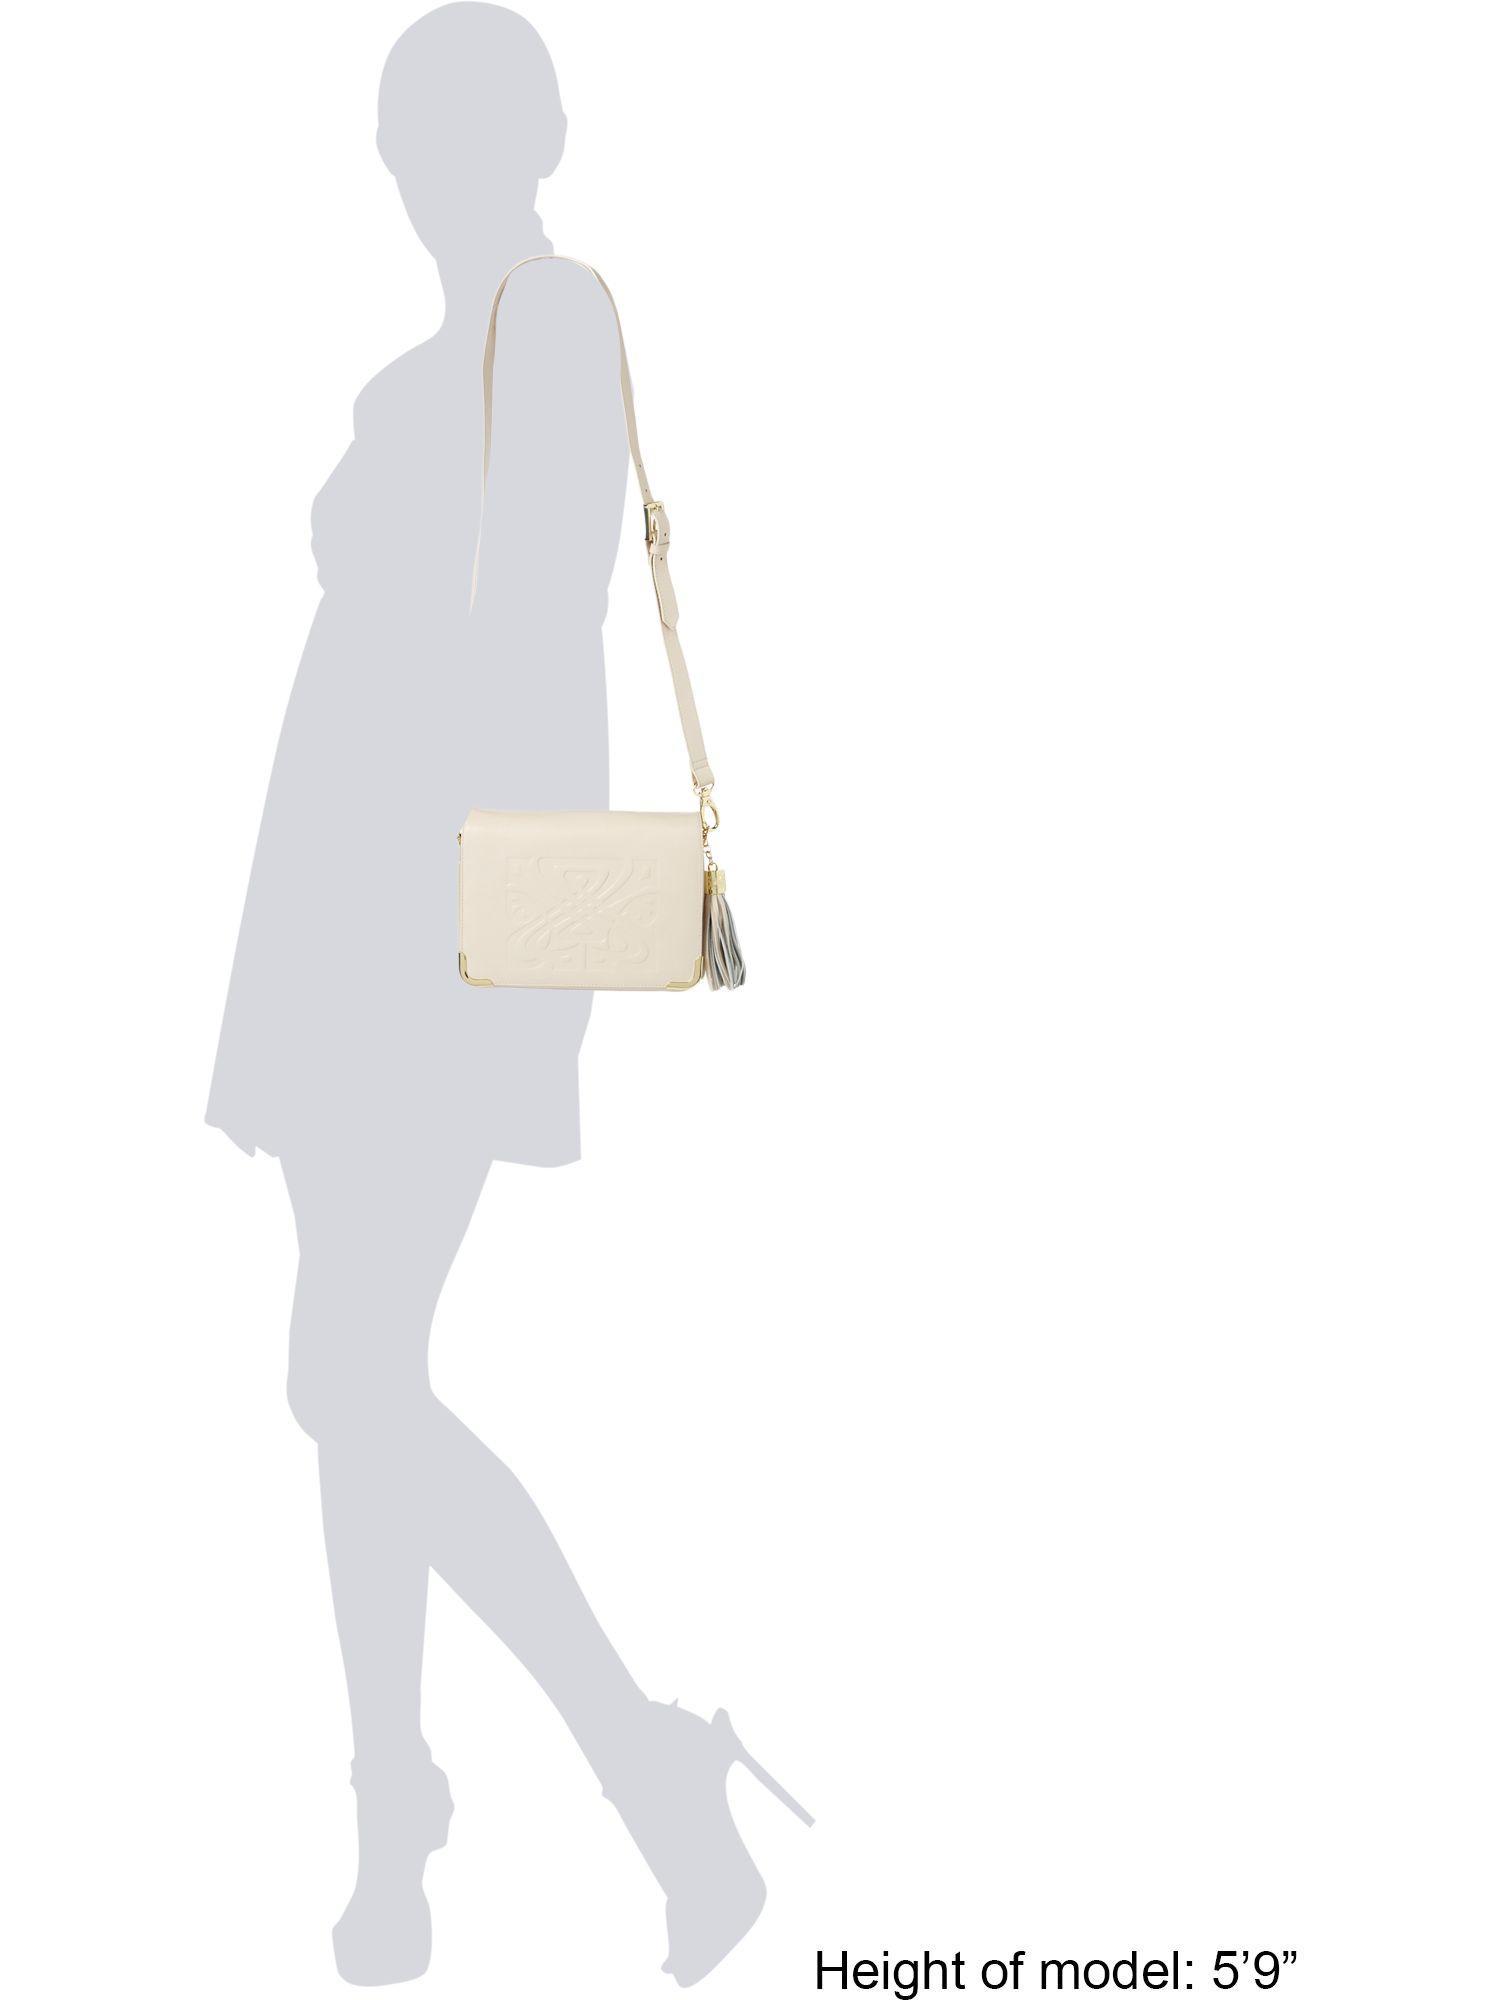 Biba Leather Gretal Crossbody Bag in Beige (Natural)